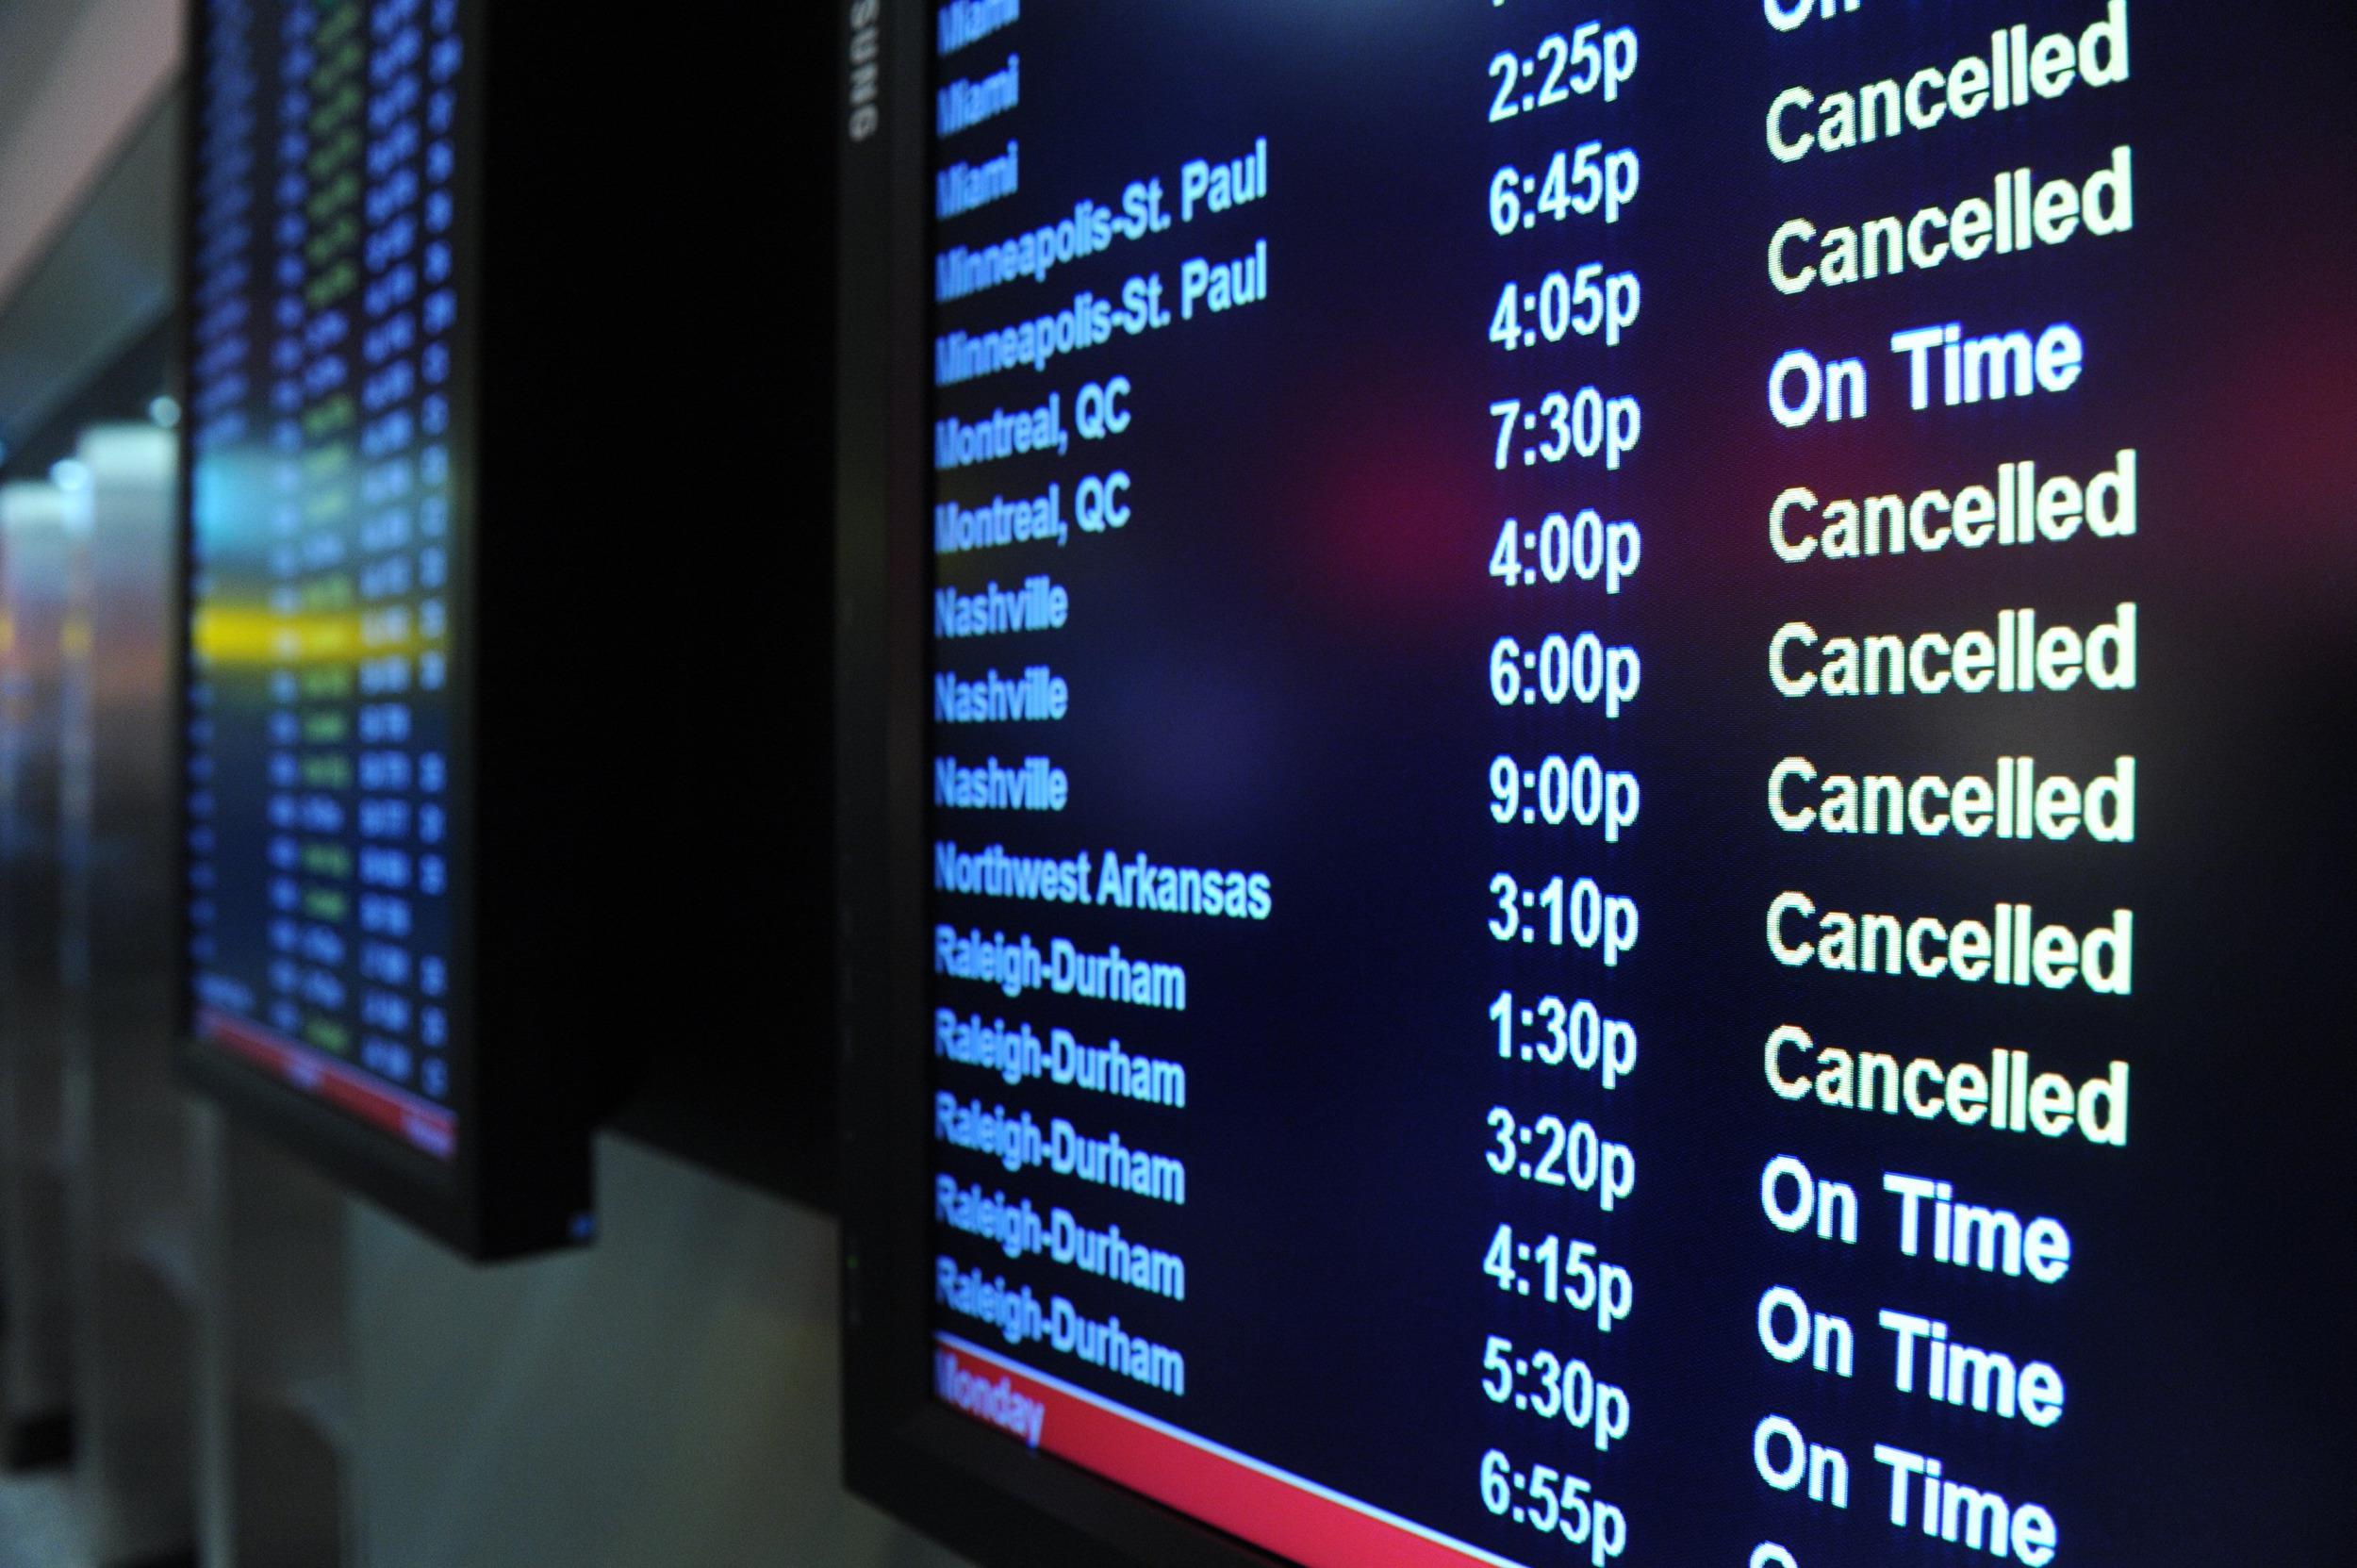 Image: canceled flights